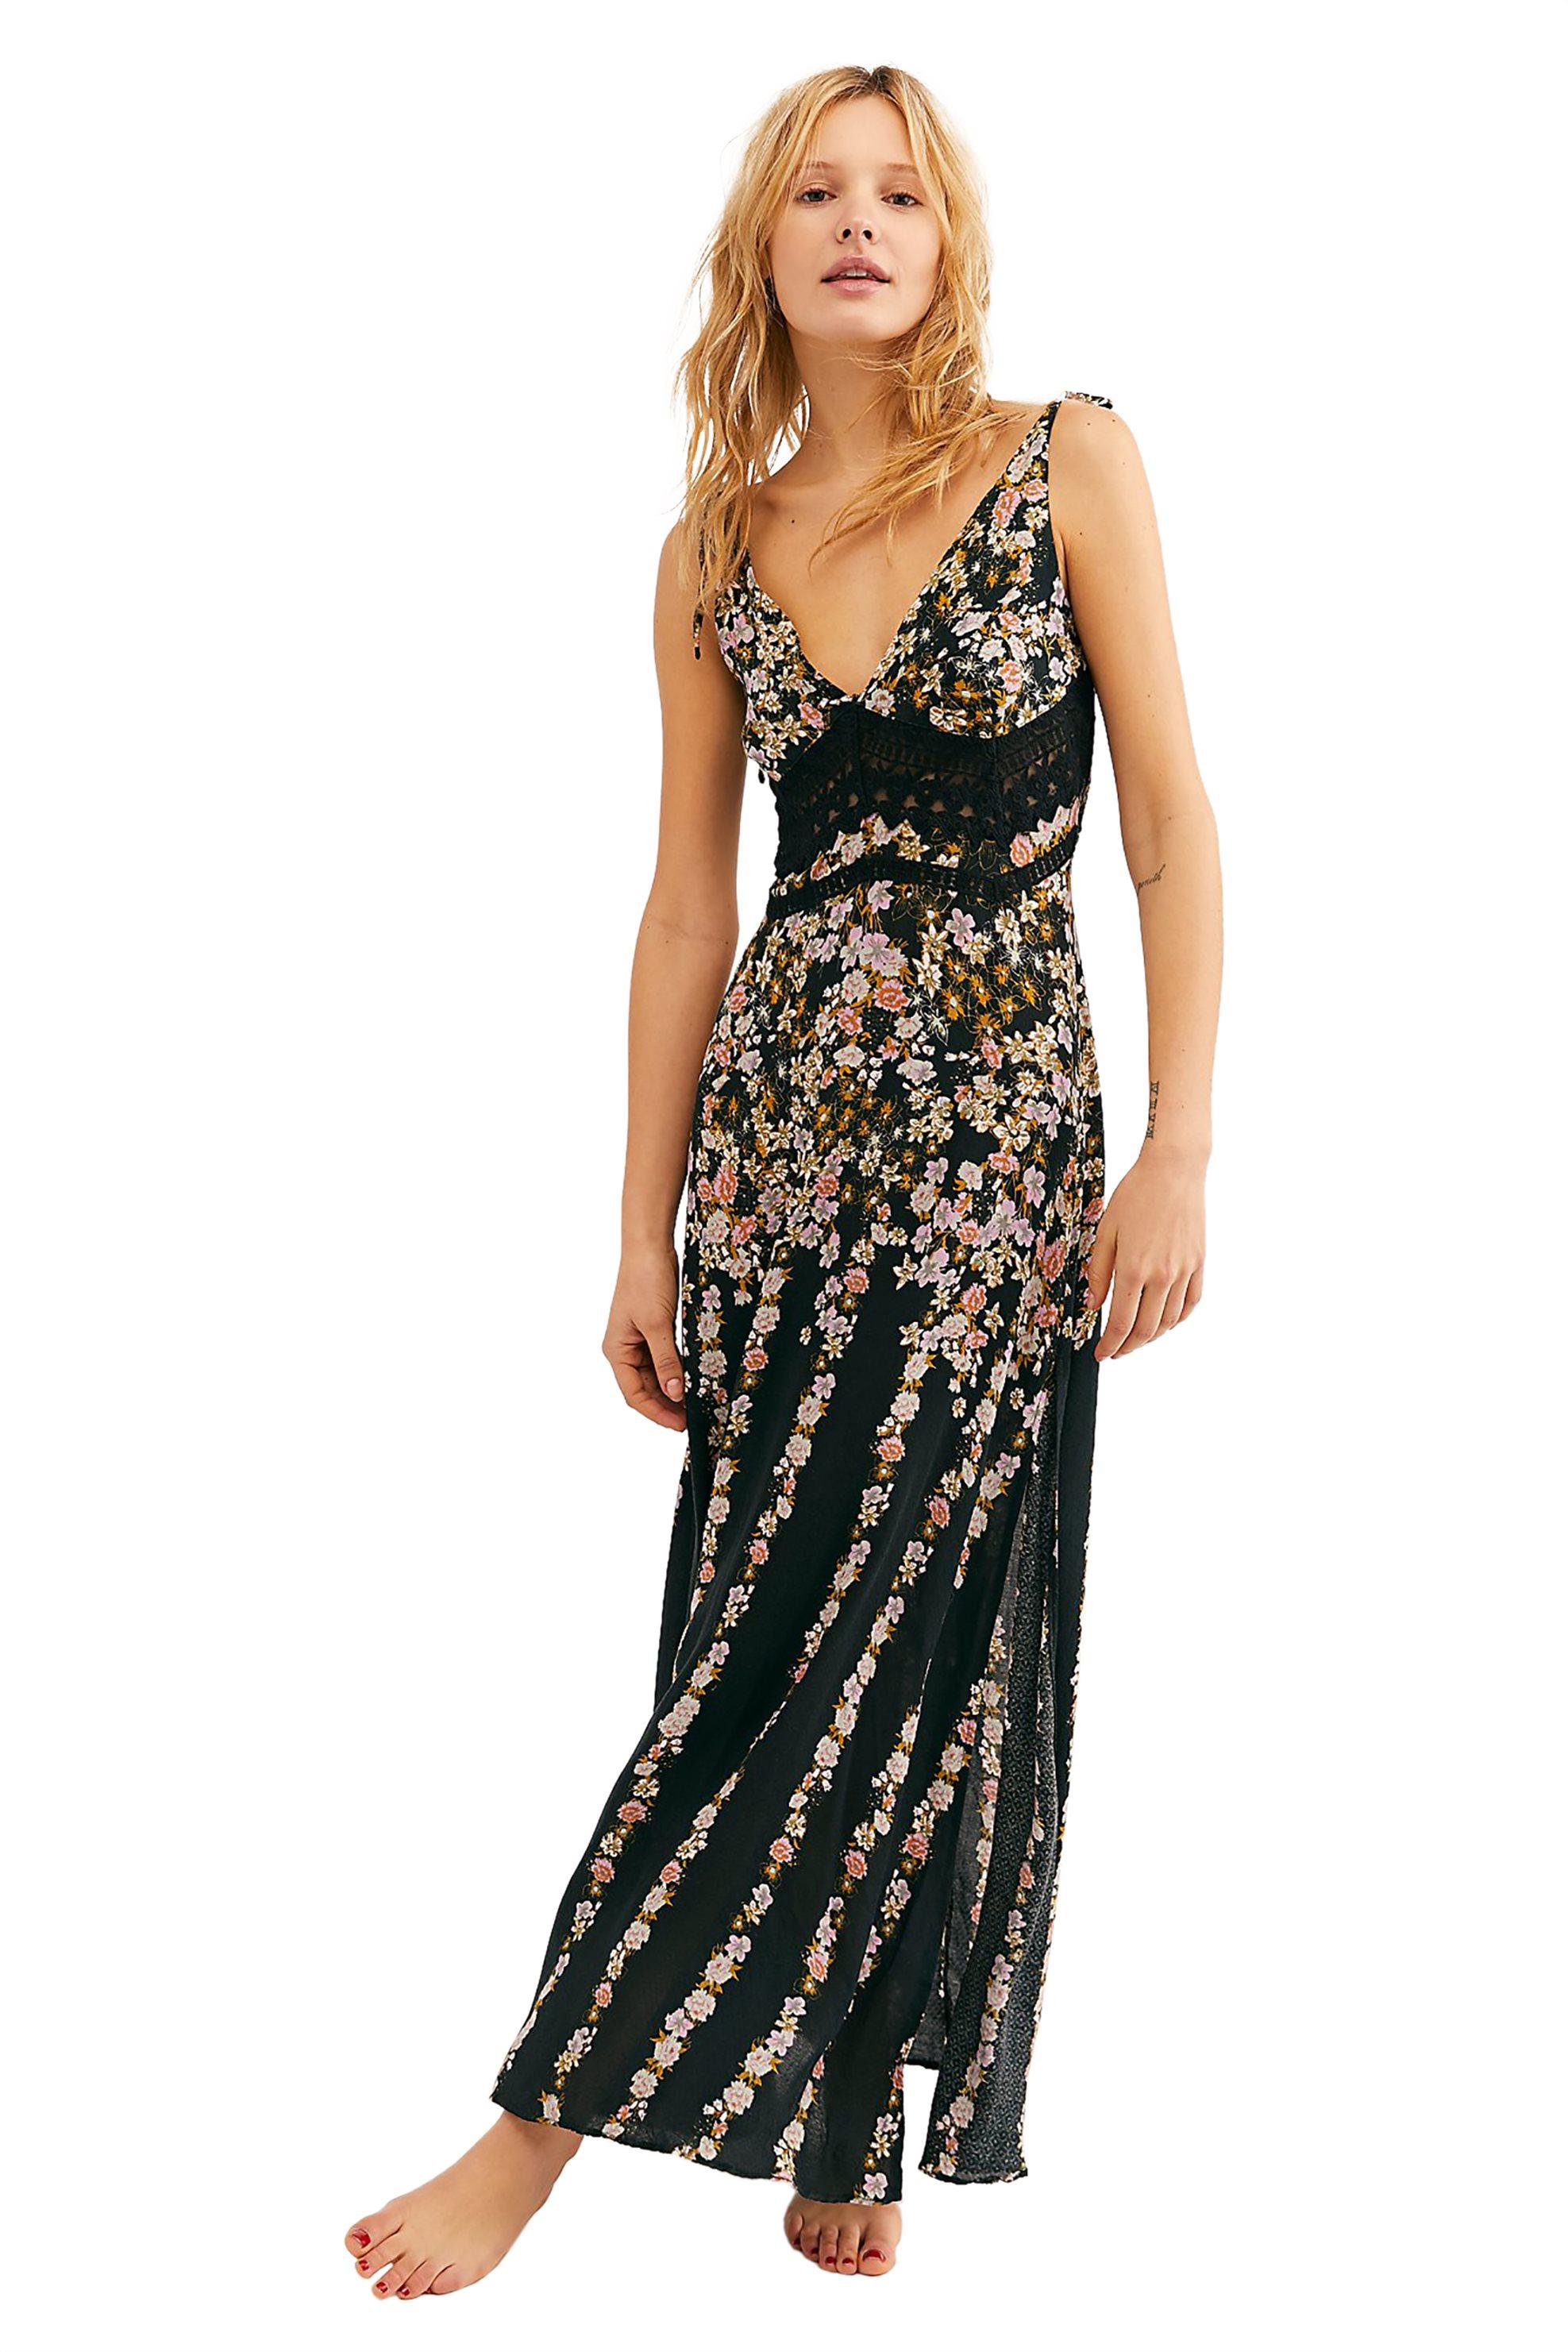 Free People γυναικείο φόρεμα εμπριμέ Claire Printed Maxi Slip - OB922530 - Μαύρο γυναικα   ρουχα   φορέματα   maxi φορέματα